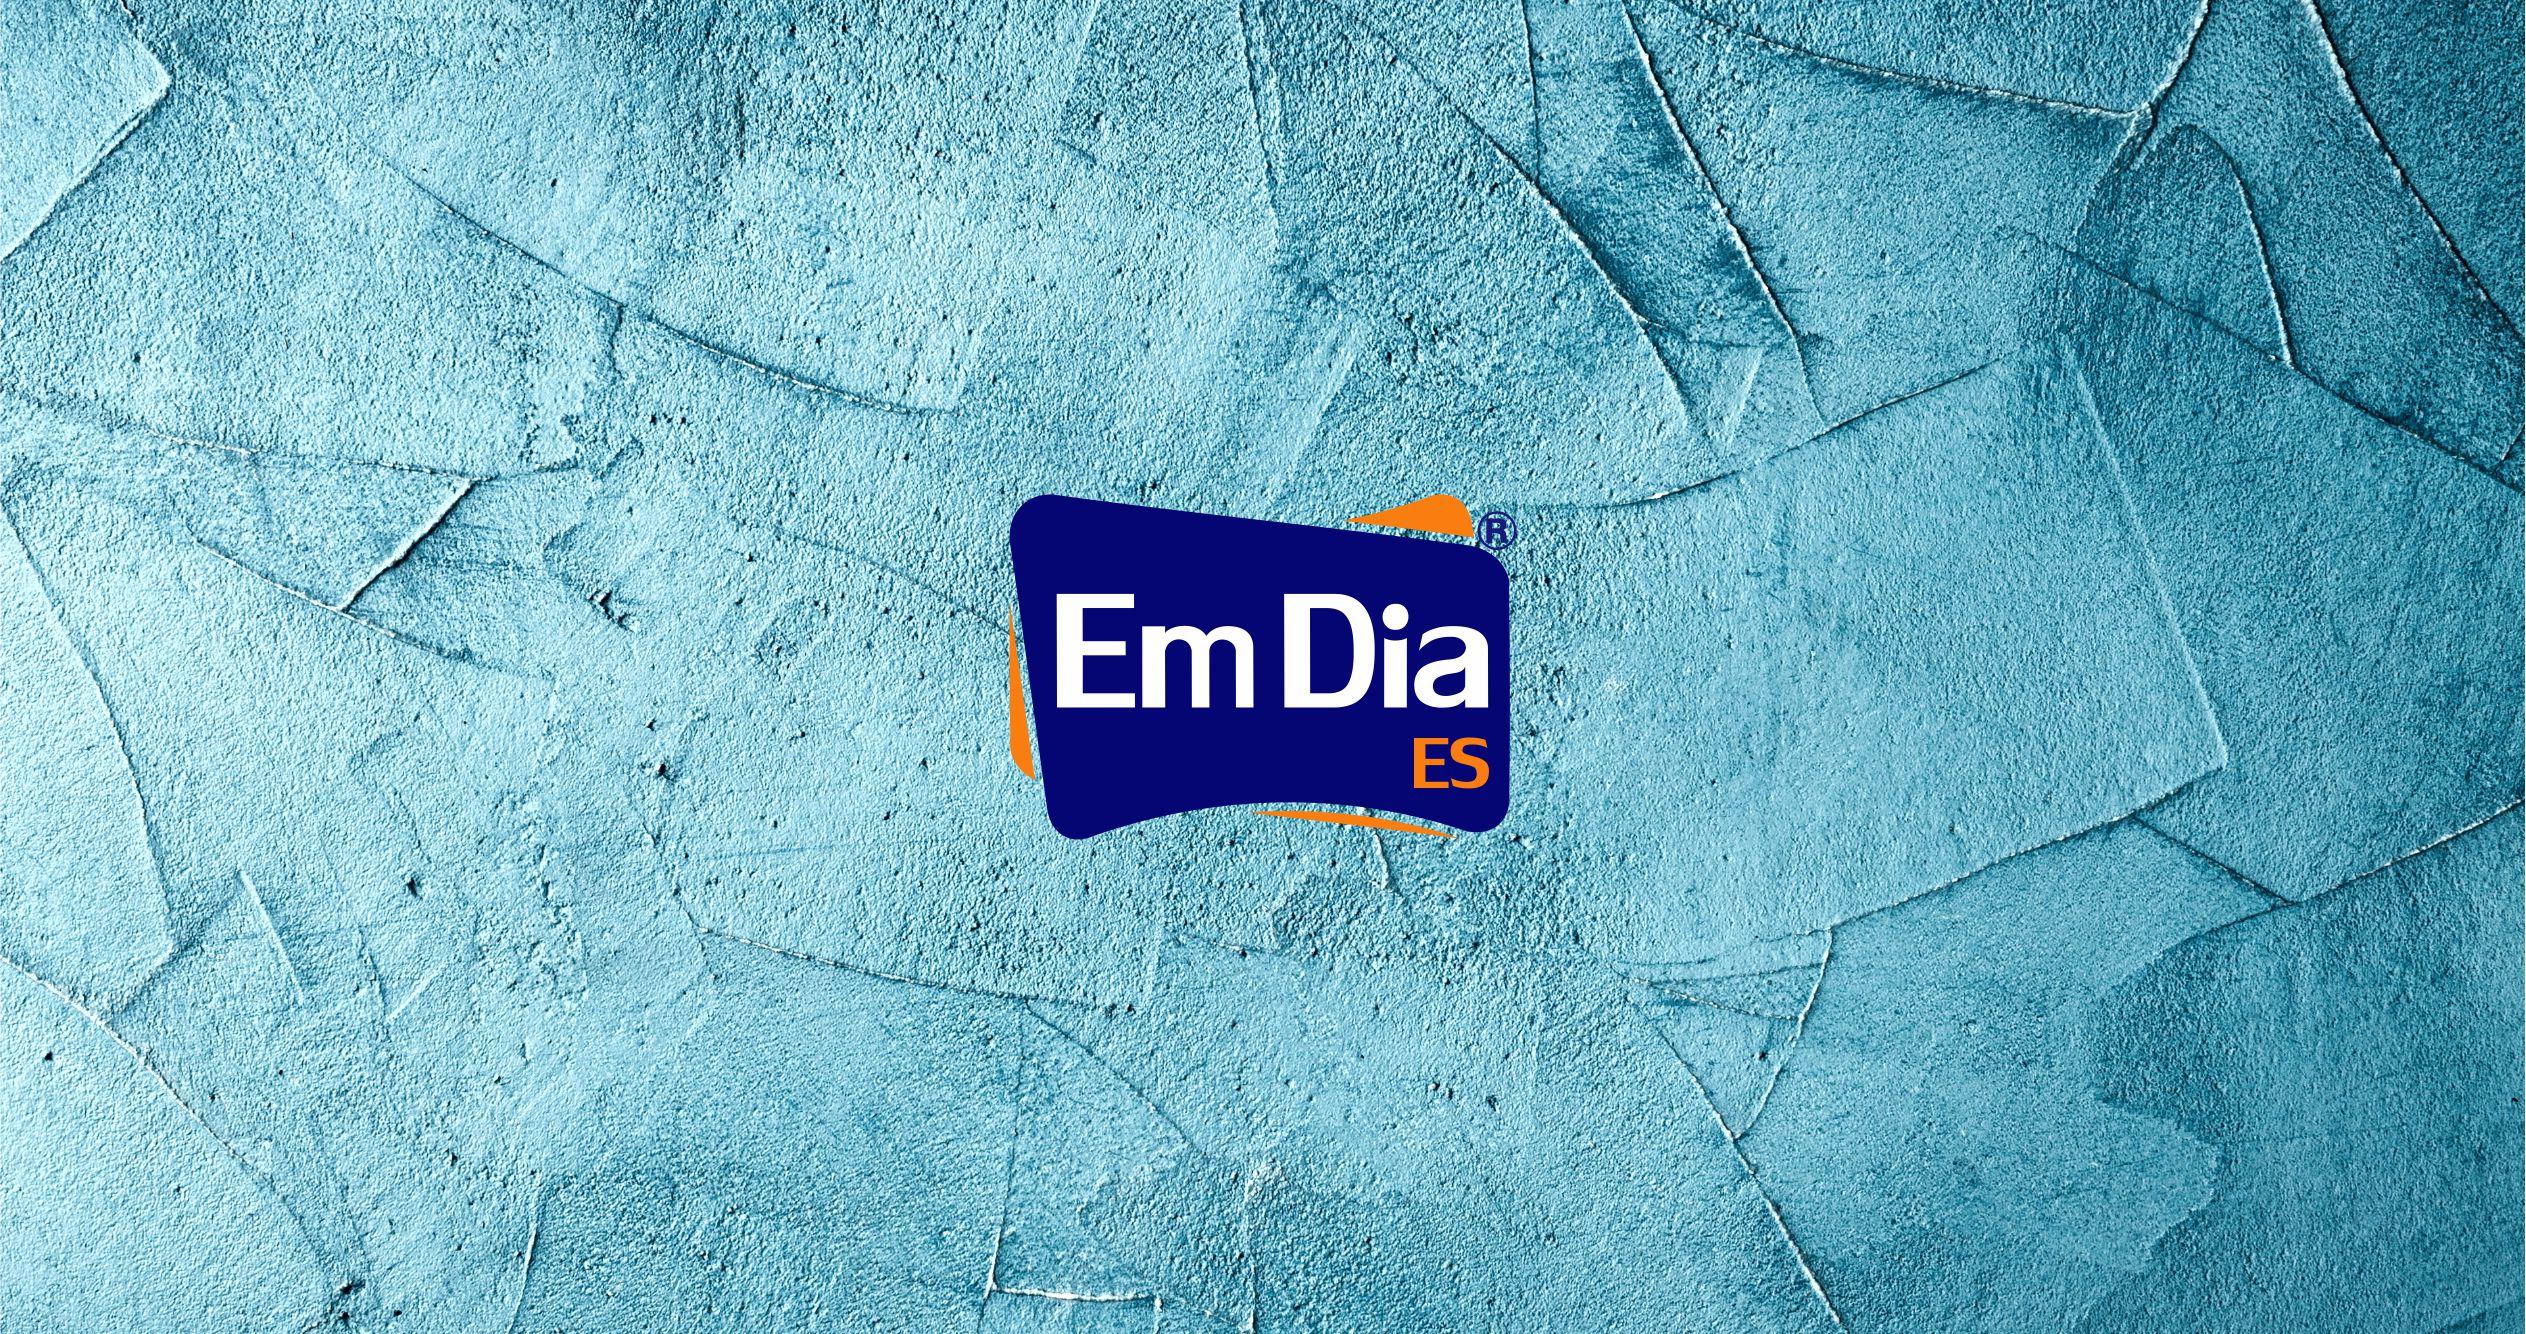 www.emdiaes.com.br Image